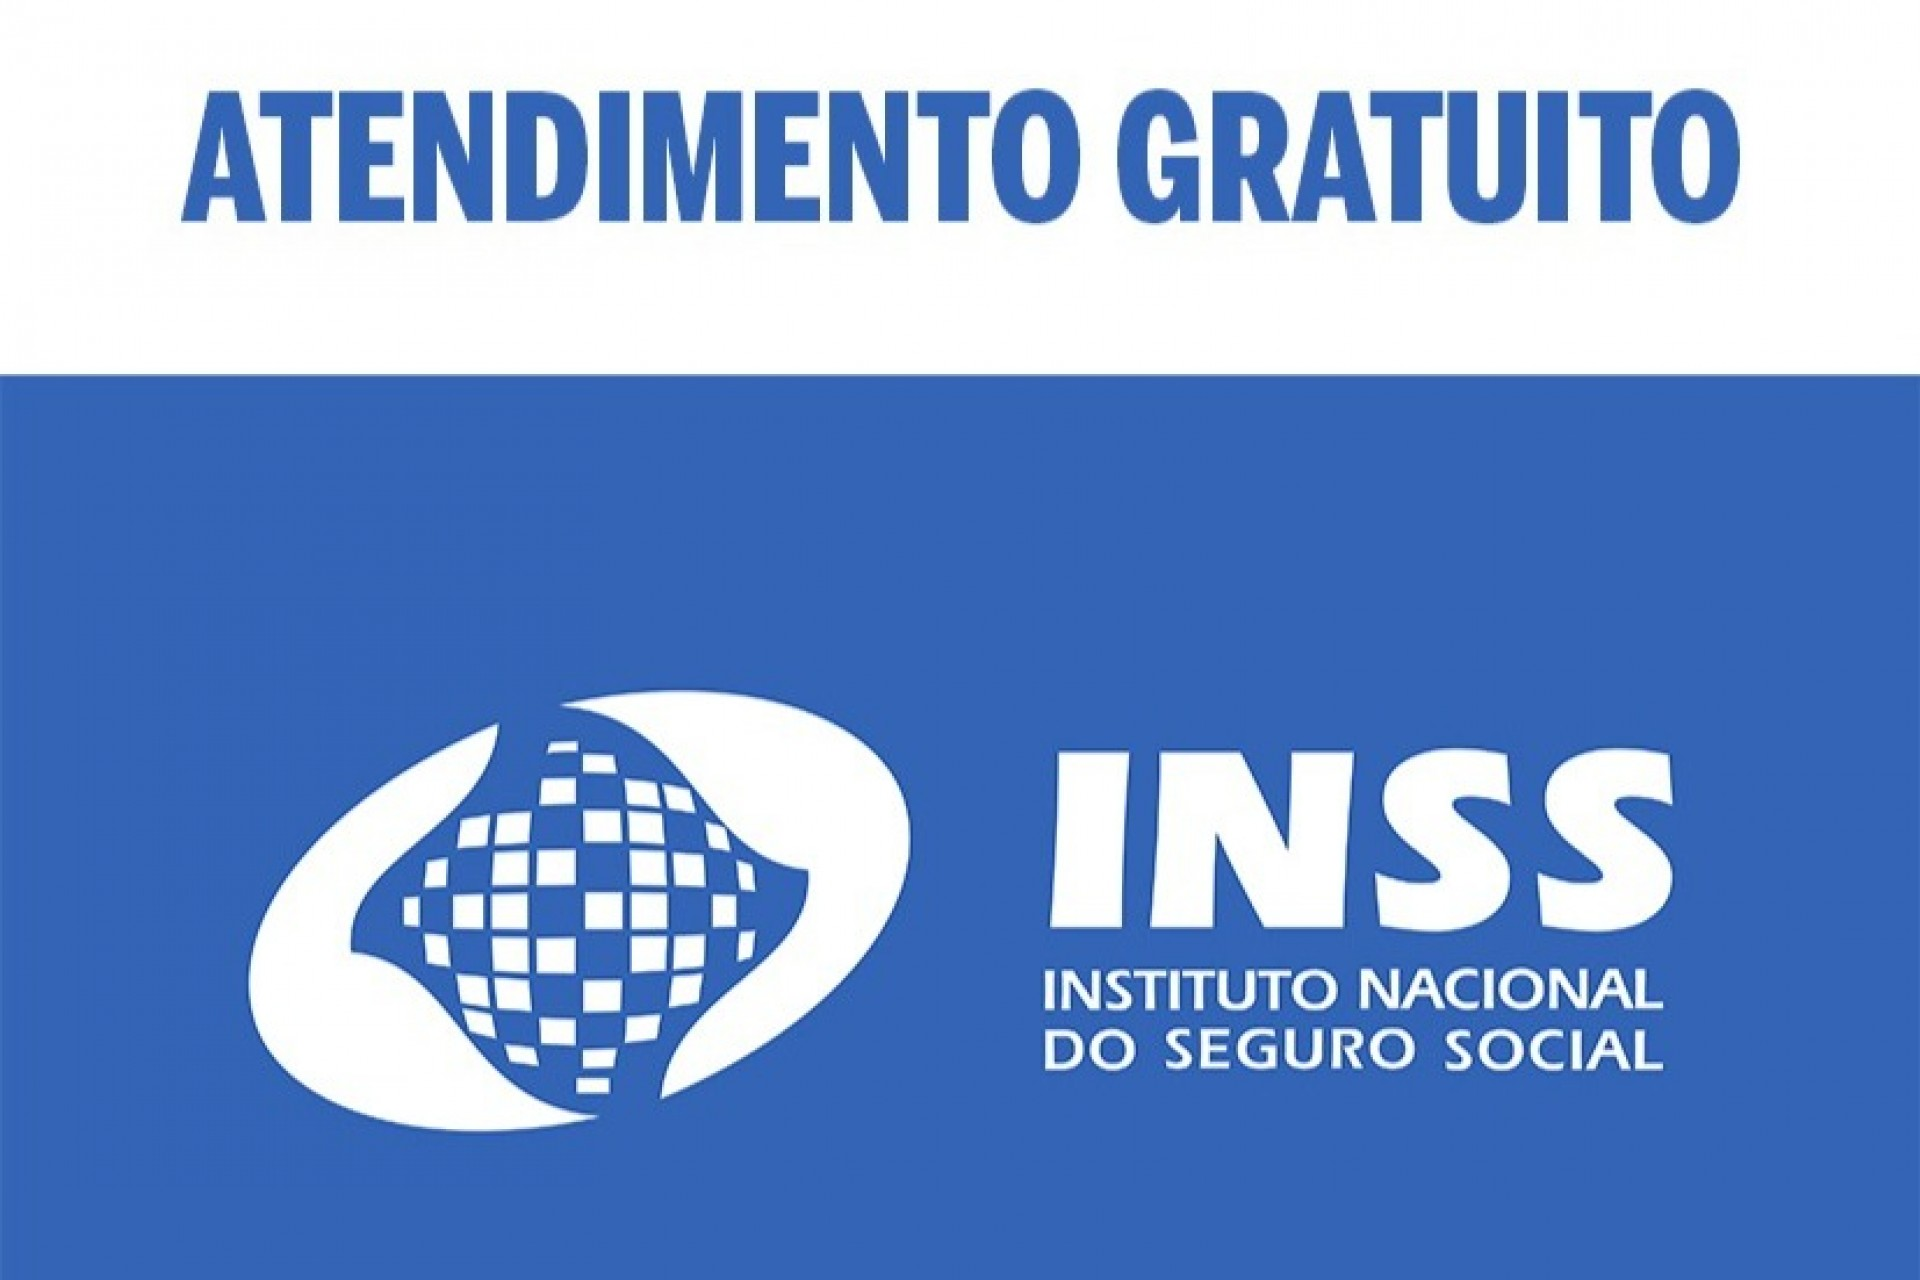 Missal possui atendimento Gratuito de consultoria para o INSS